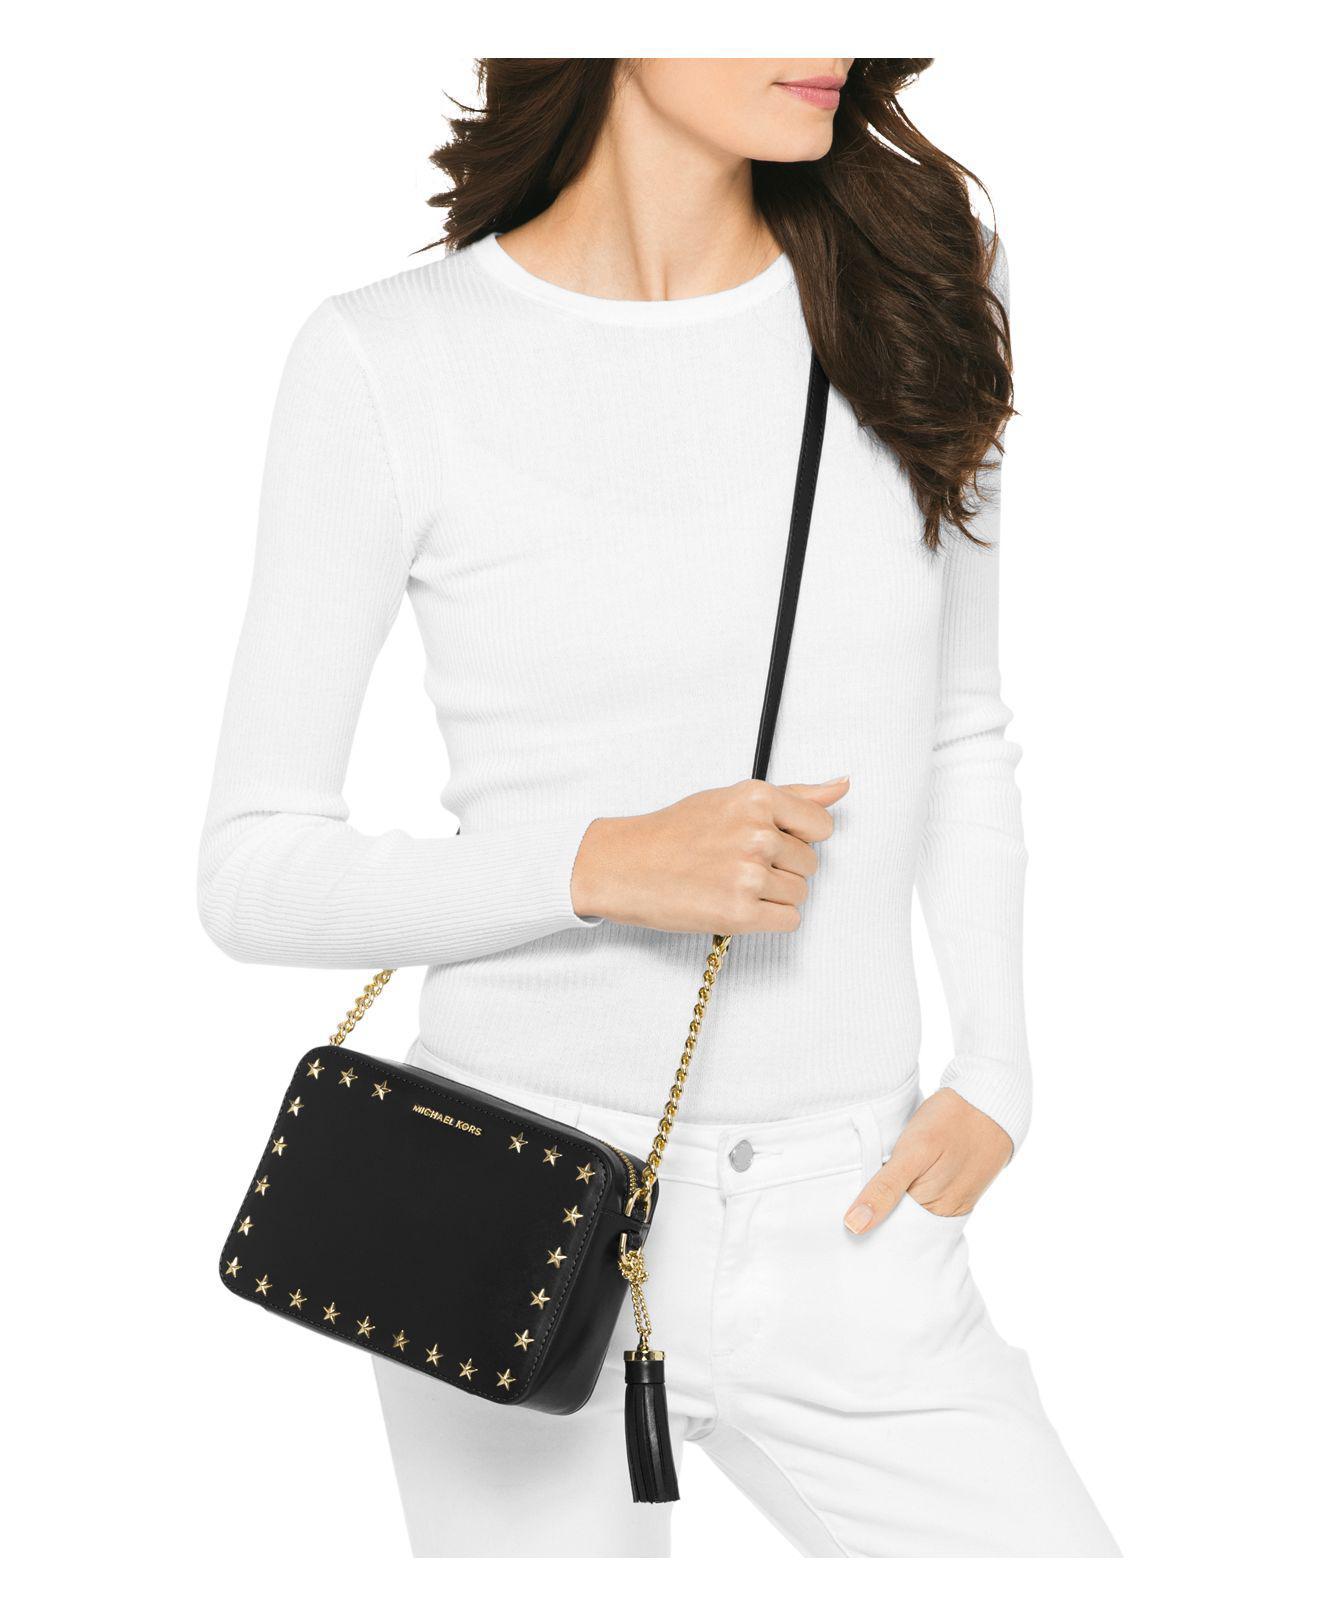 449744df5711 Lyst - MICHAEL Michael Kors Ginny Star Stud Medium Leather Camera Bag